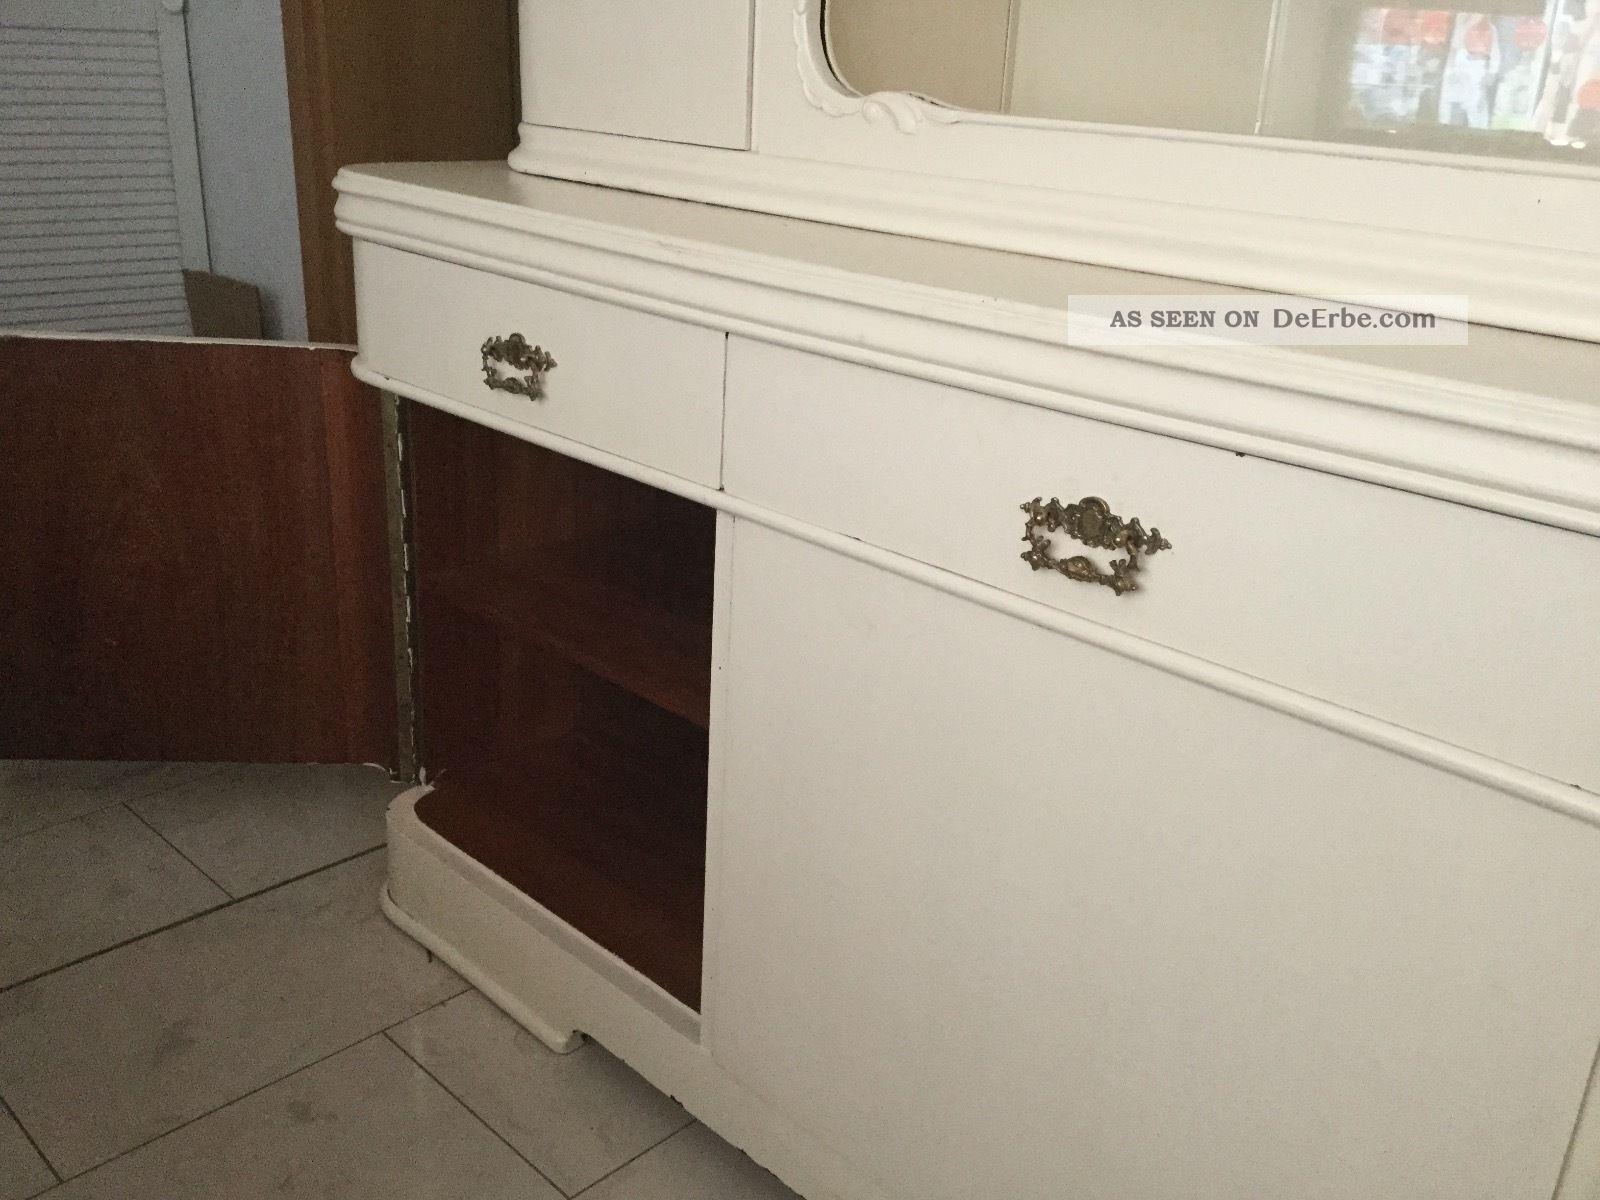 Altes Antikes Kuchenbuffet Shabby Chic Creme Vintage Stil Sehr Chic Vb